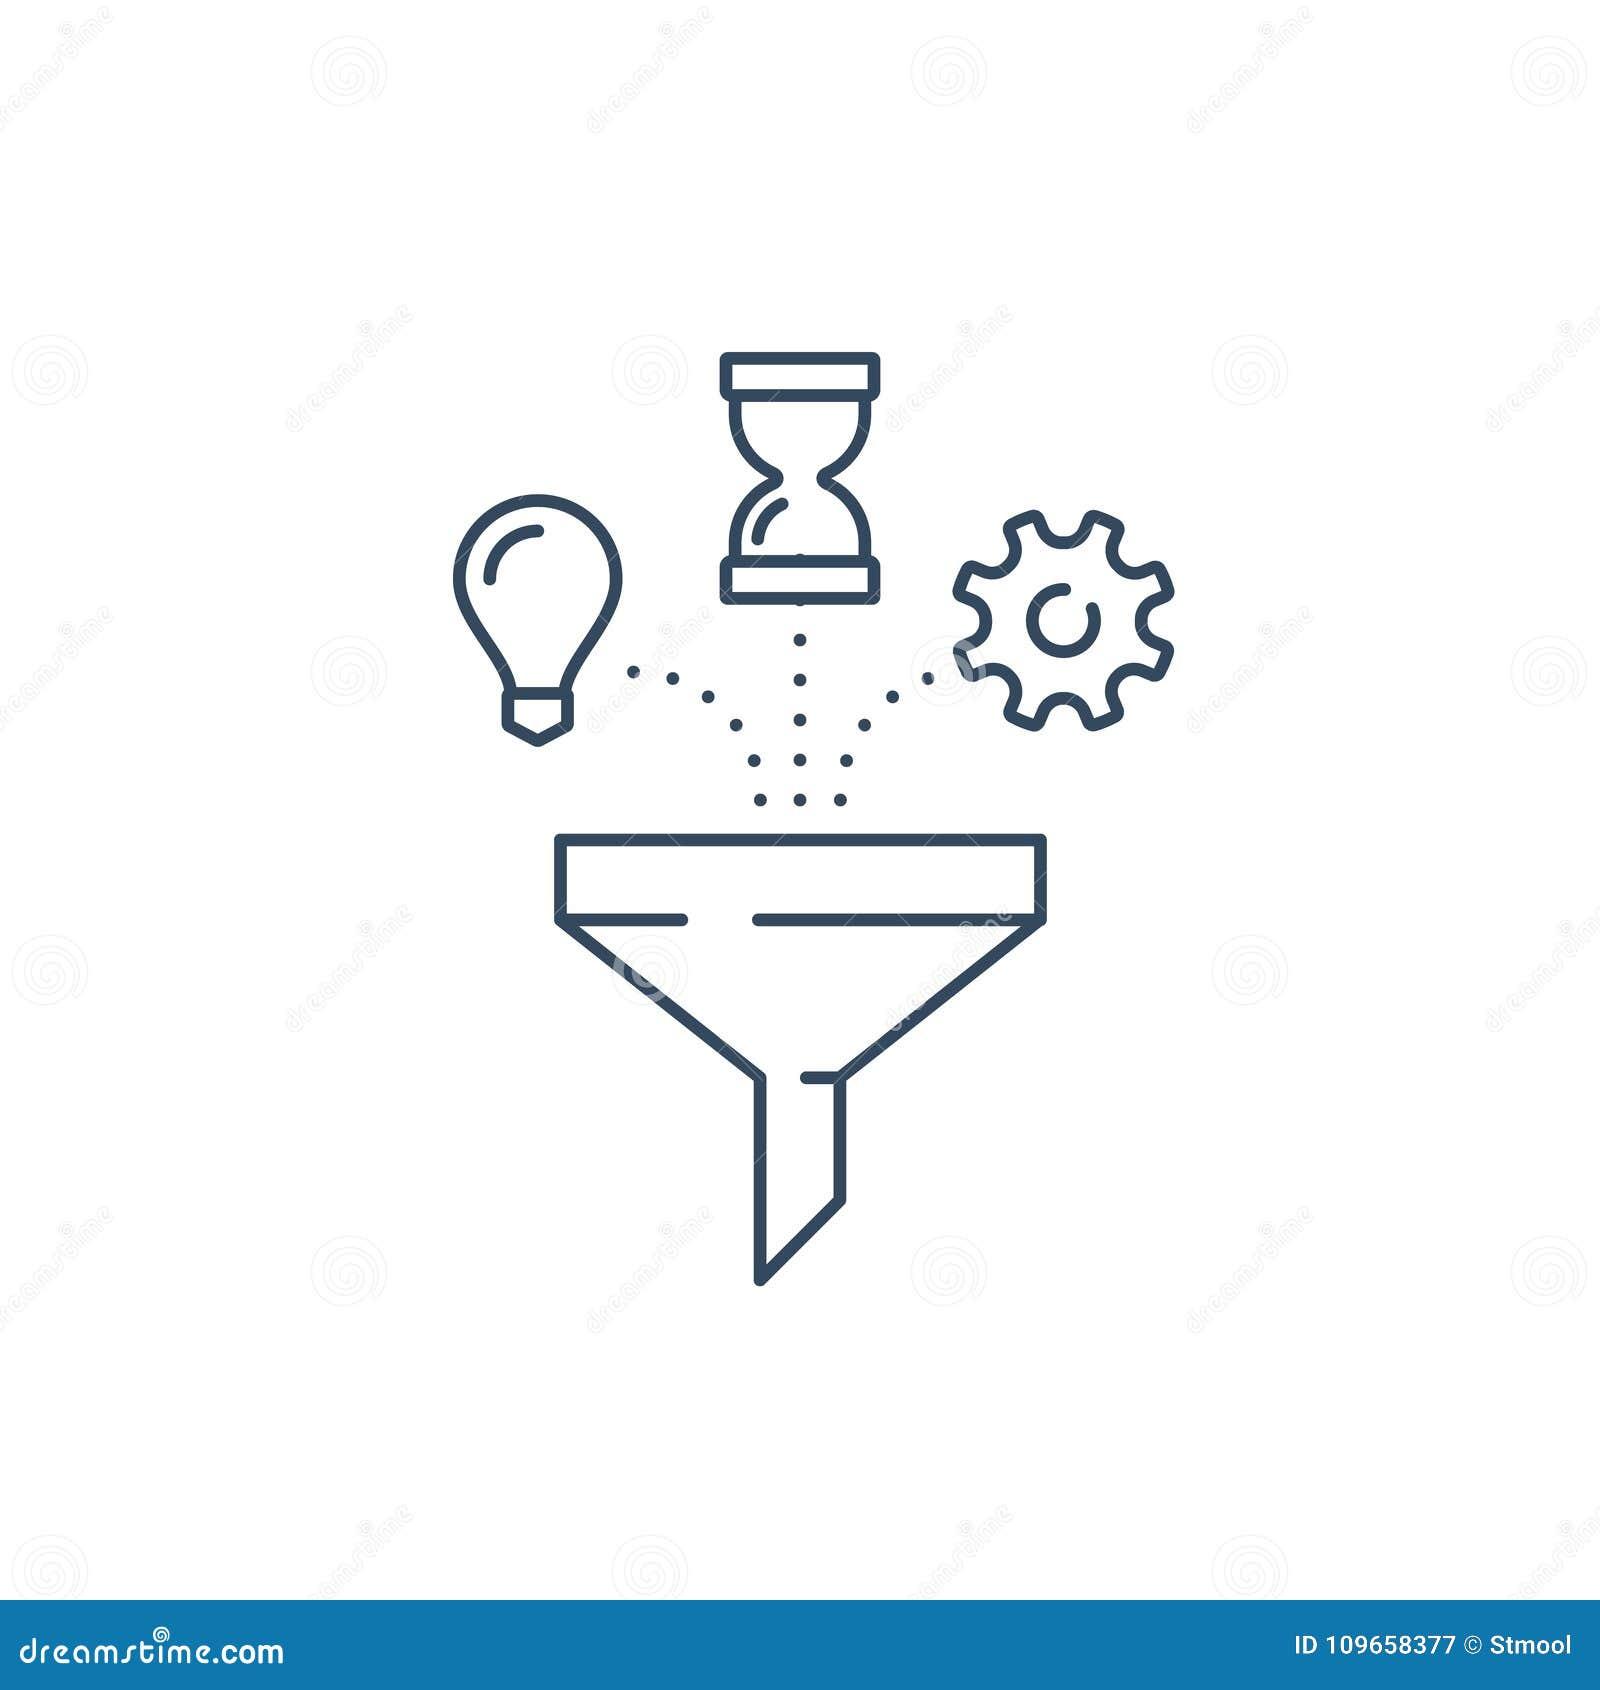 21162d2942d7 Idea Light Bulb, Sand Clock And Cogwheel, Project Management Parts ...